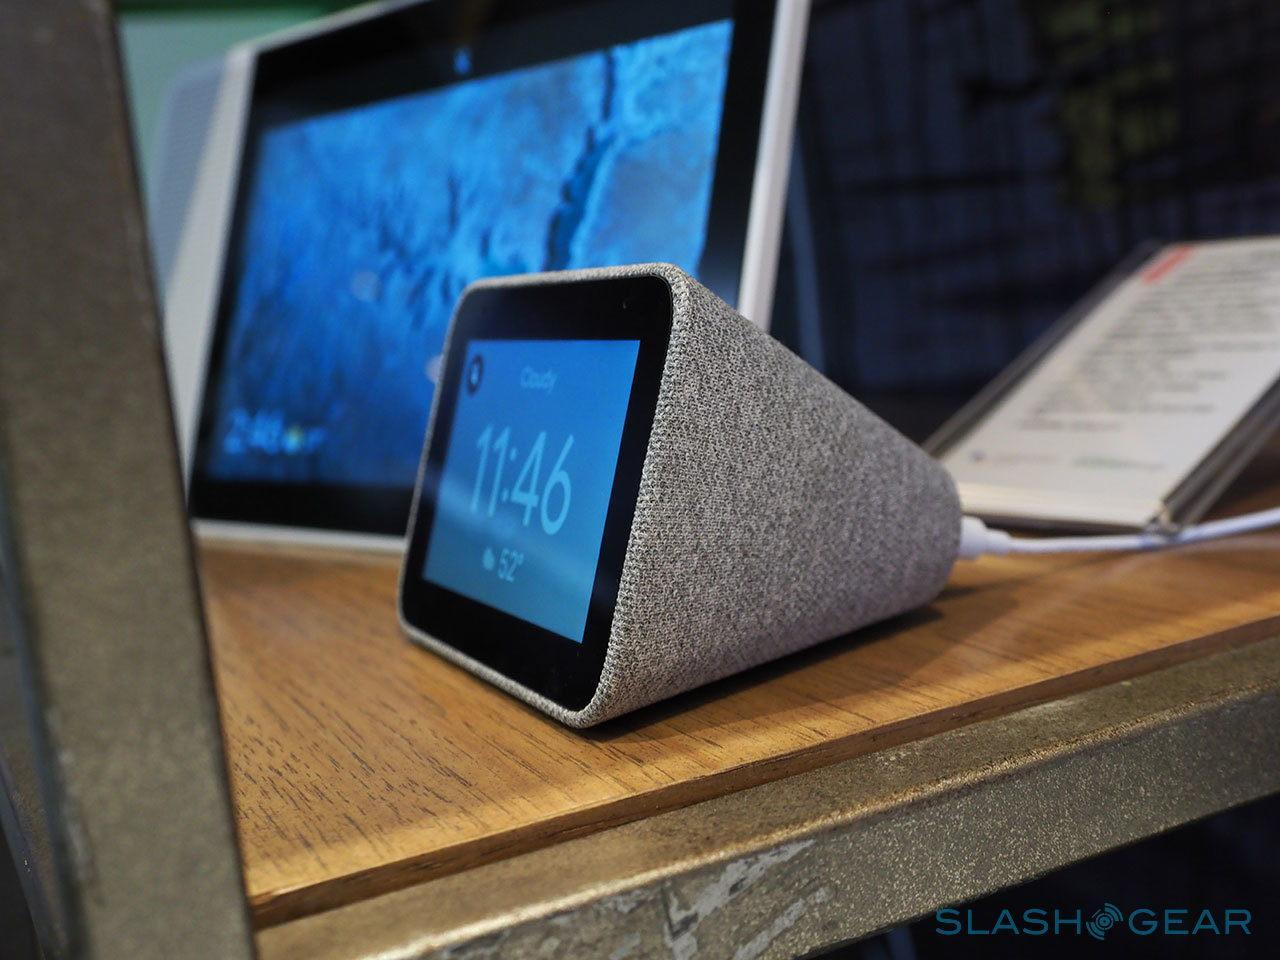 Lenovo Smart Clock brings Google Assistant to your bedside